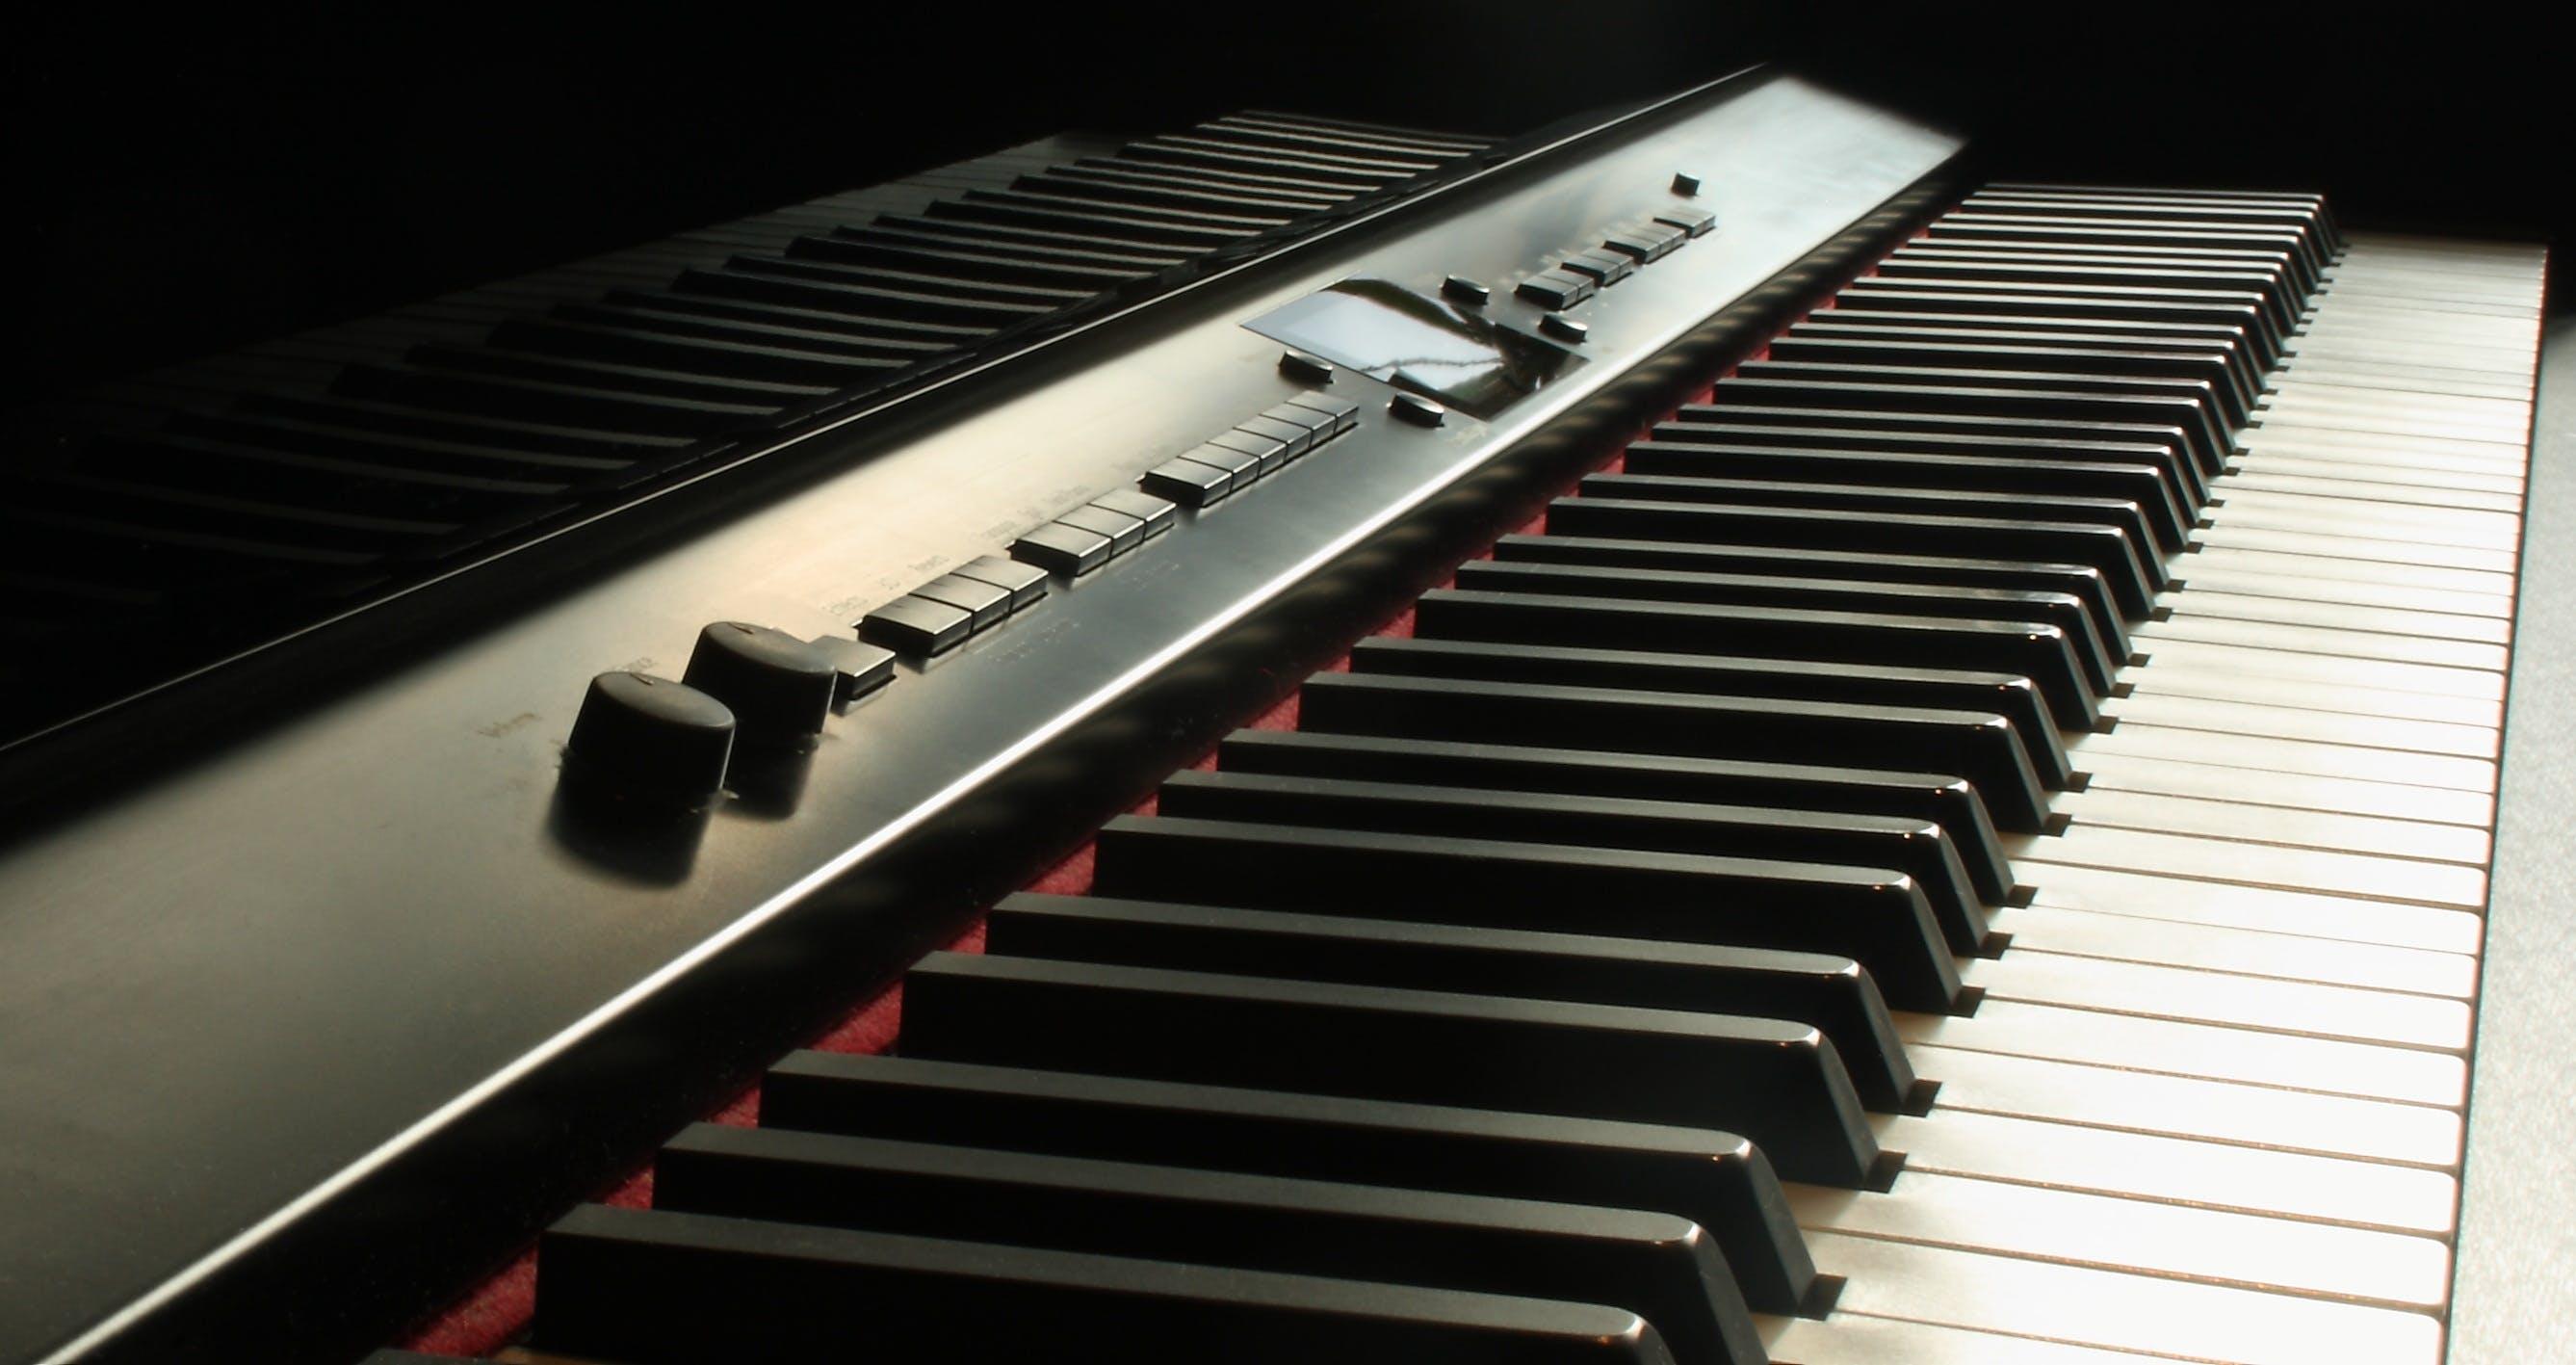 Black Electronic Keyboard